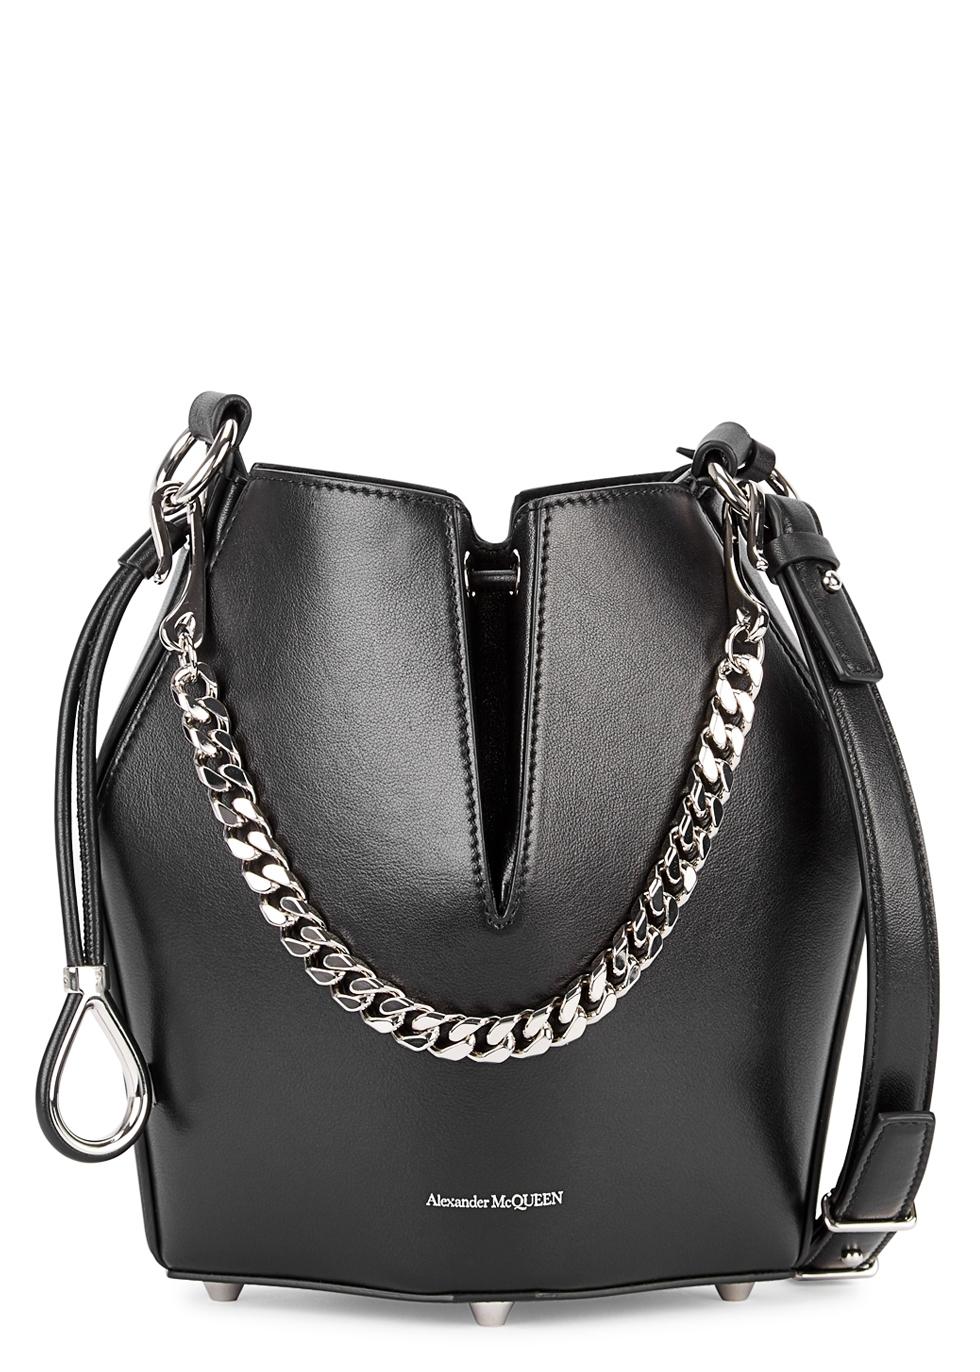 106dfb92ad37bb Alexander McQueen Scarves, Shoes, Dresses, Bags - Harvey Nichols